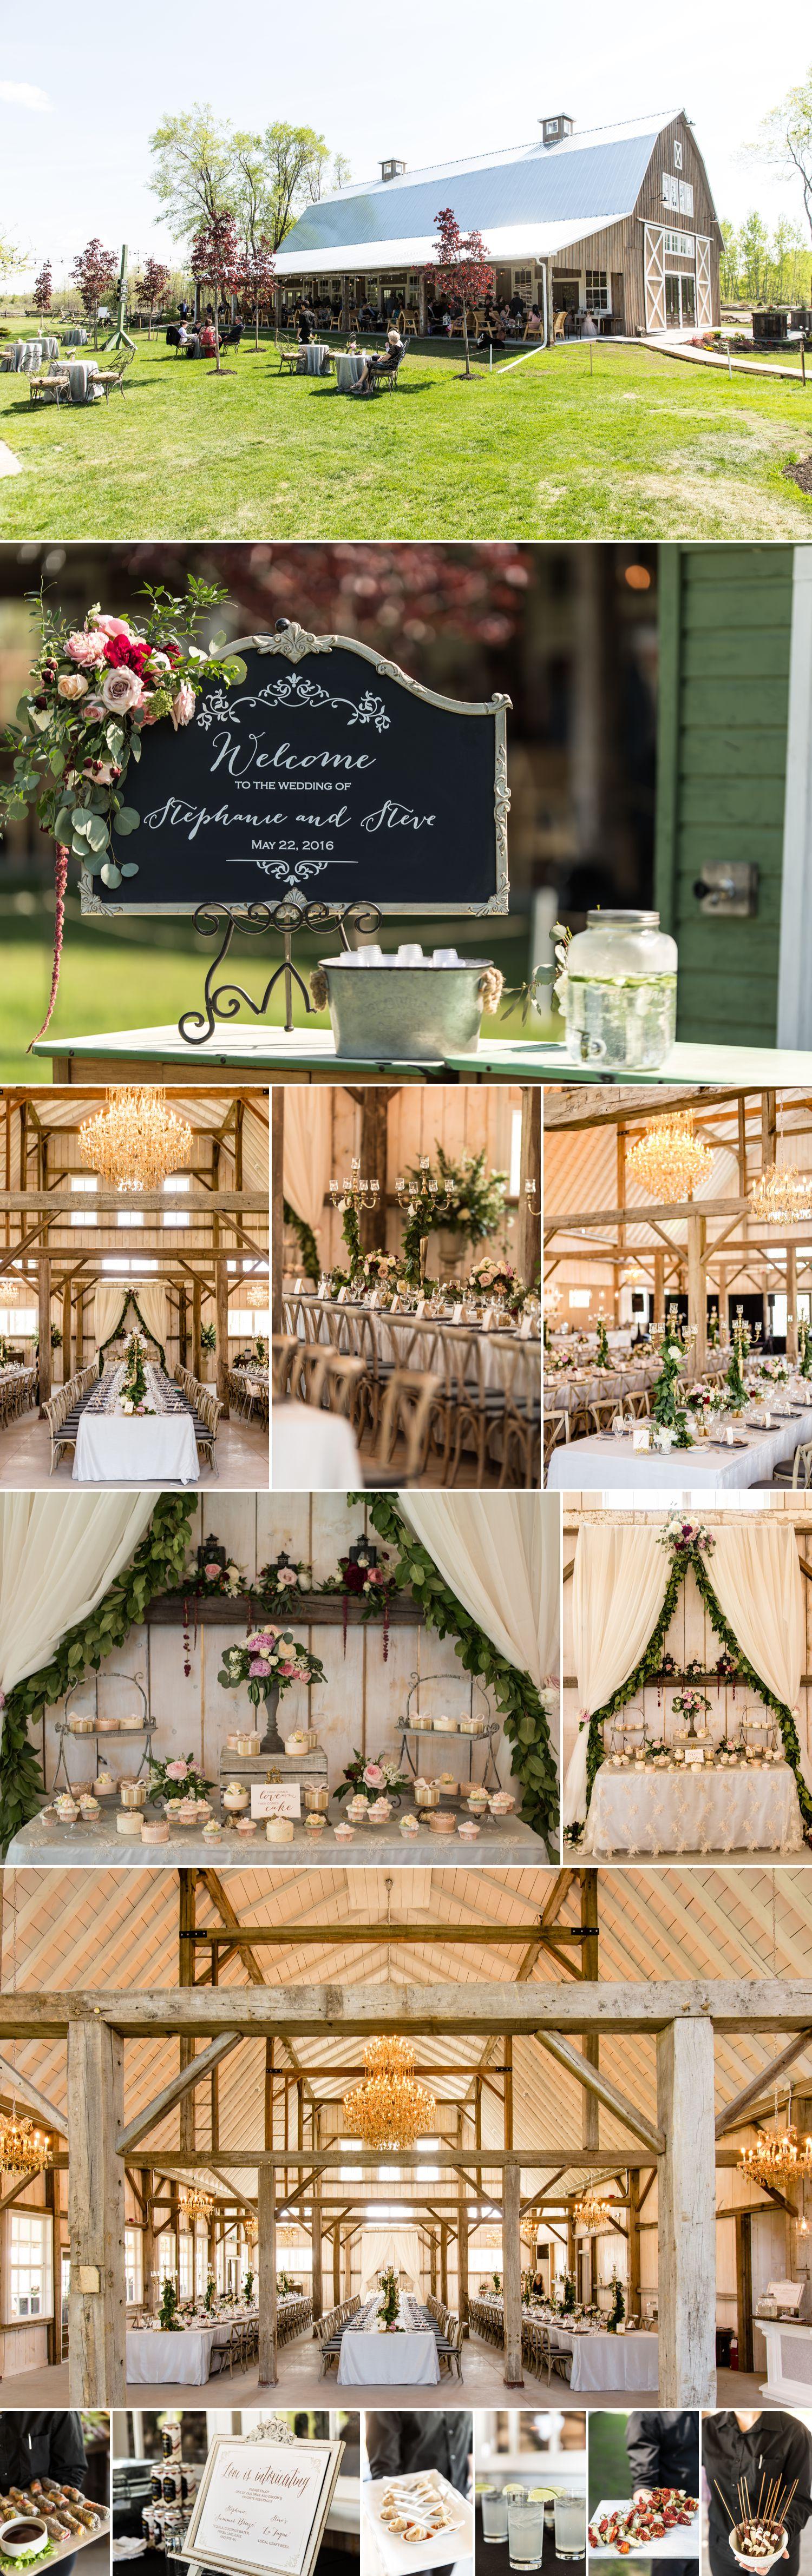 wedding reception details stonefields carleton place ontario